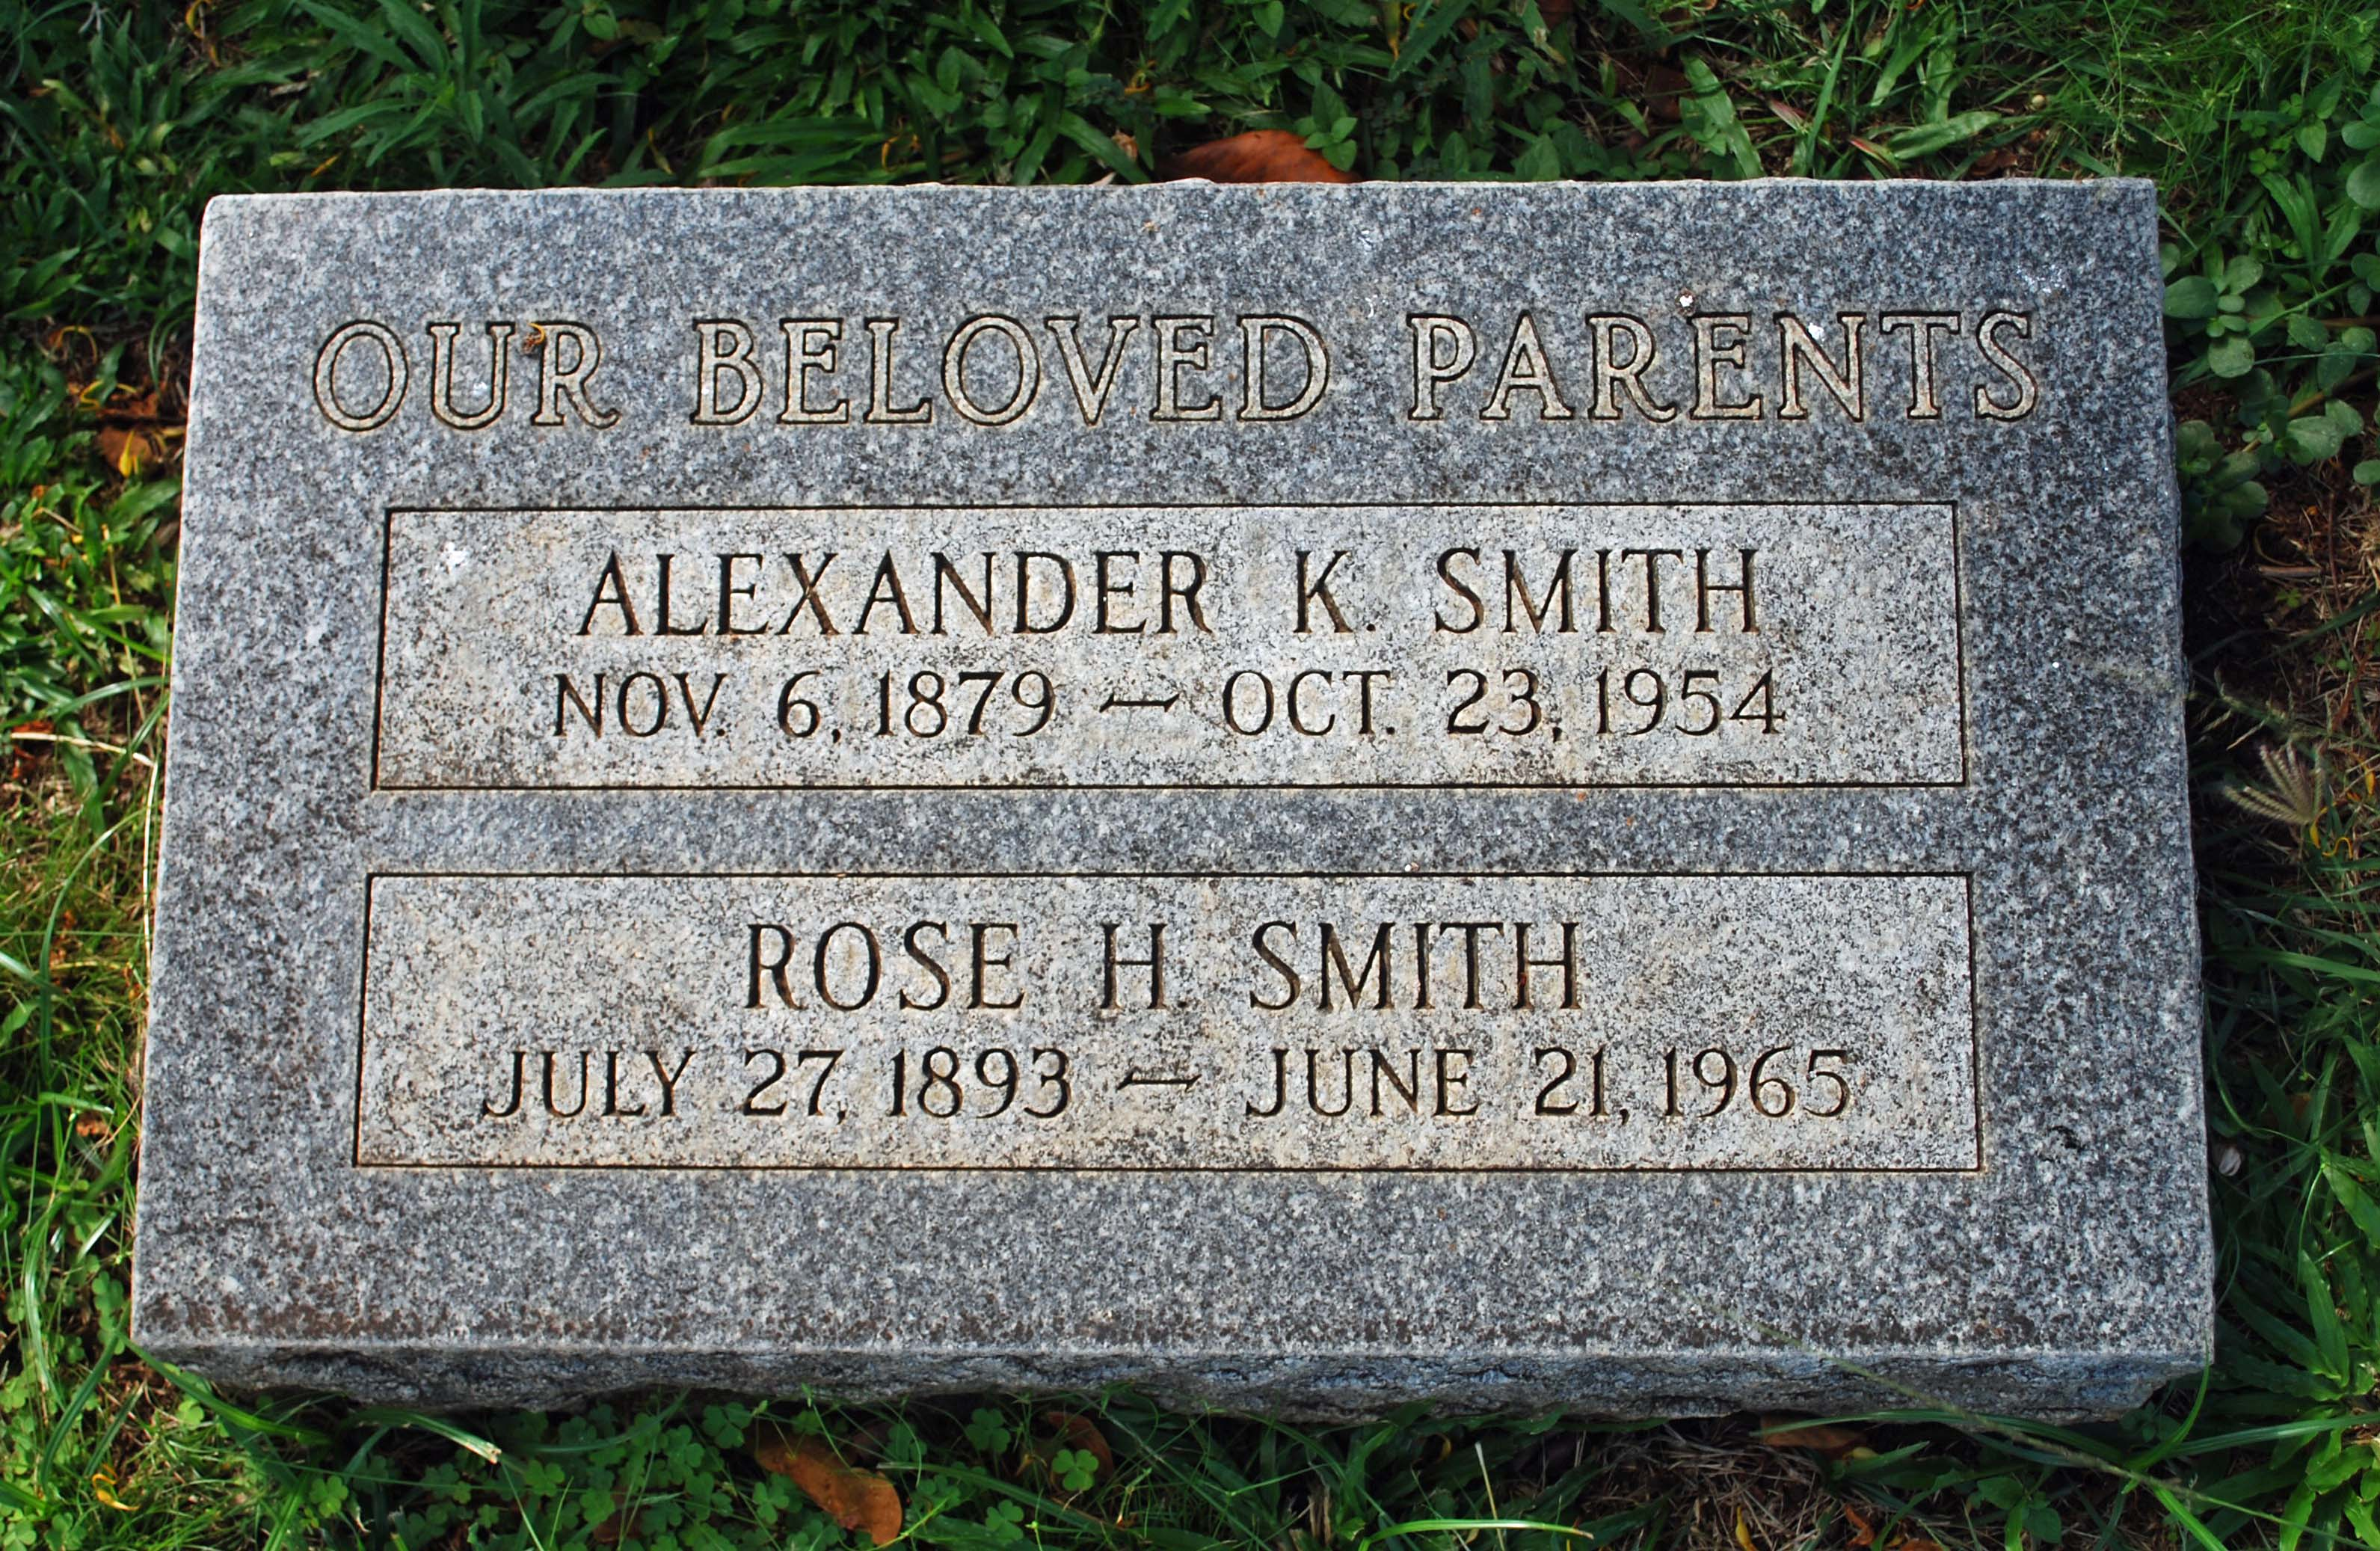 Rose H. Smith